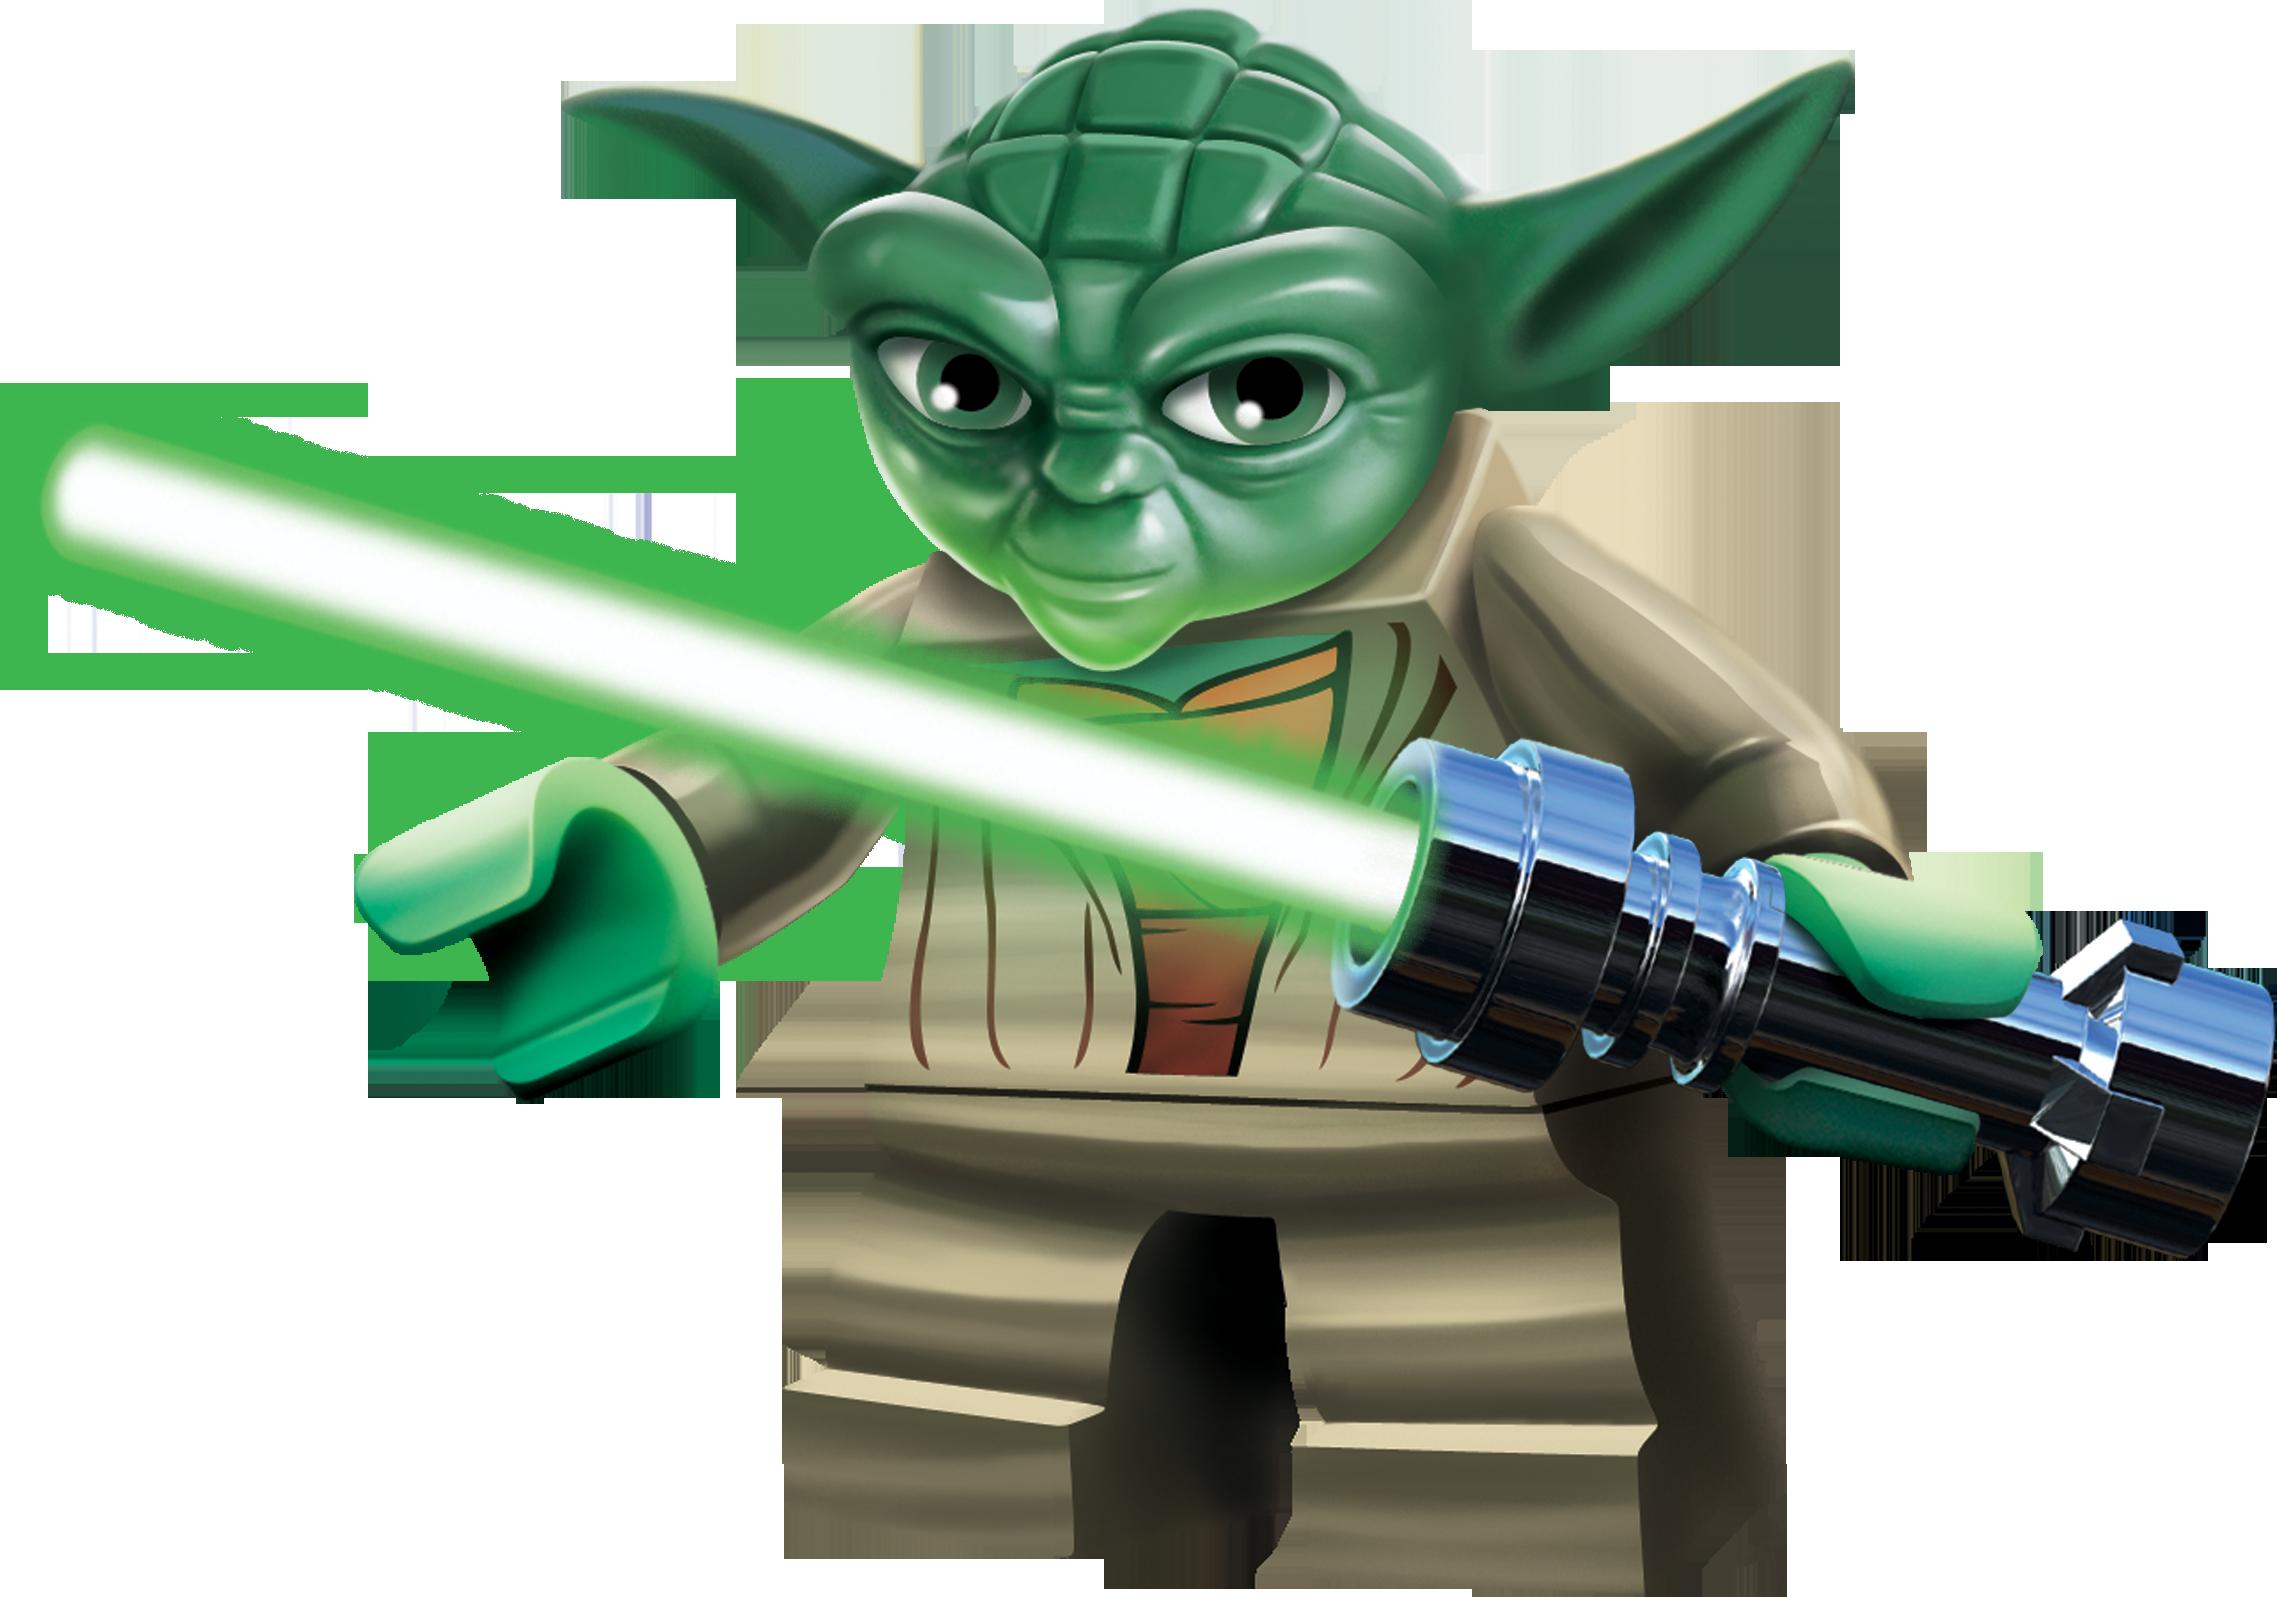 4 x STAR WARS lego LIGHT GREEN LIGHTSABERS jedi sith minifig weapons clone wars